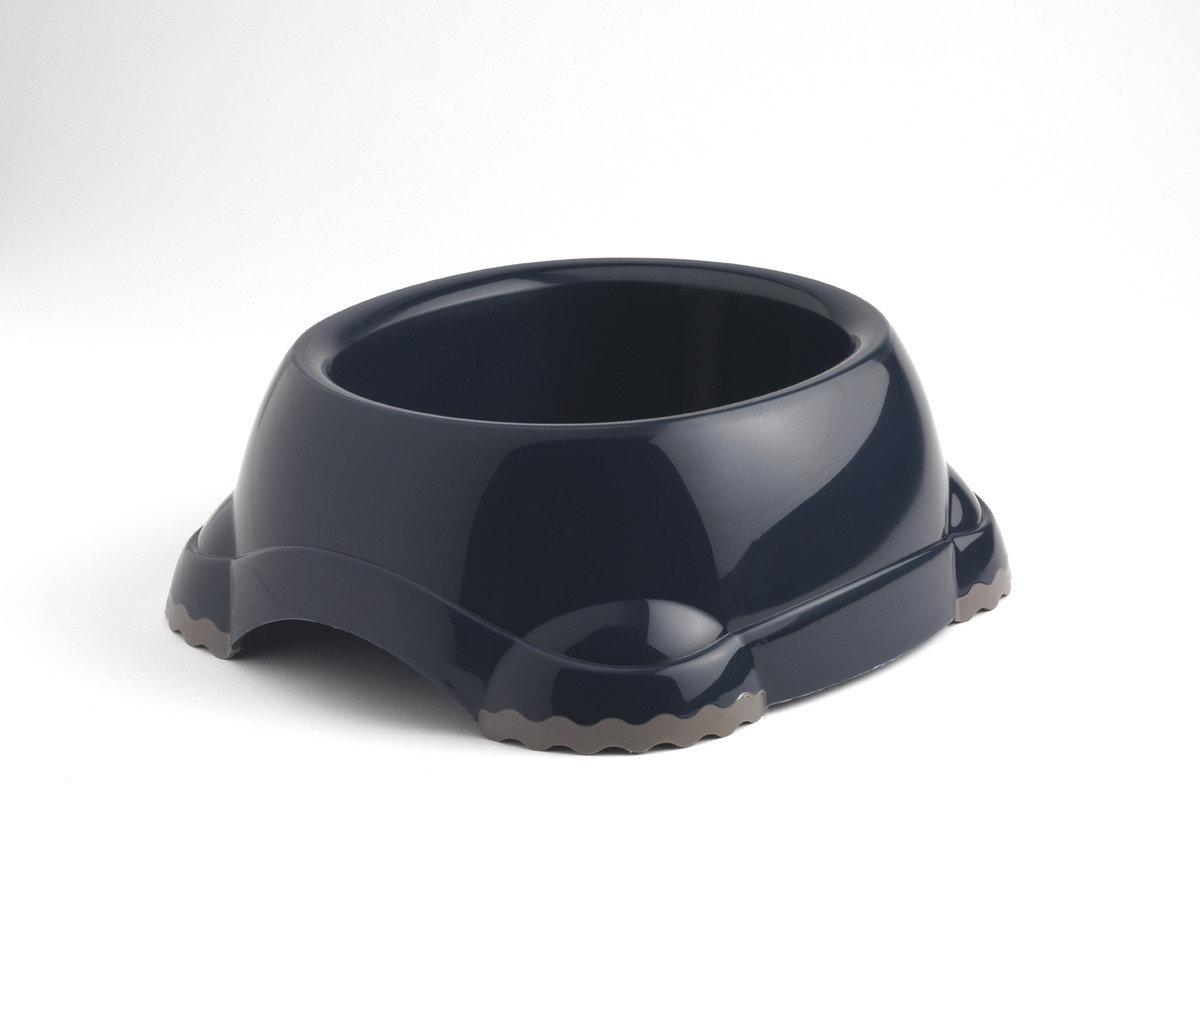 MPH103-21 Smarty Bowl  寵物碗 H103 - 深藍色